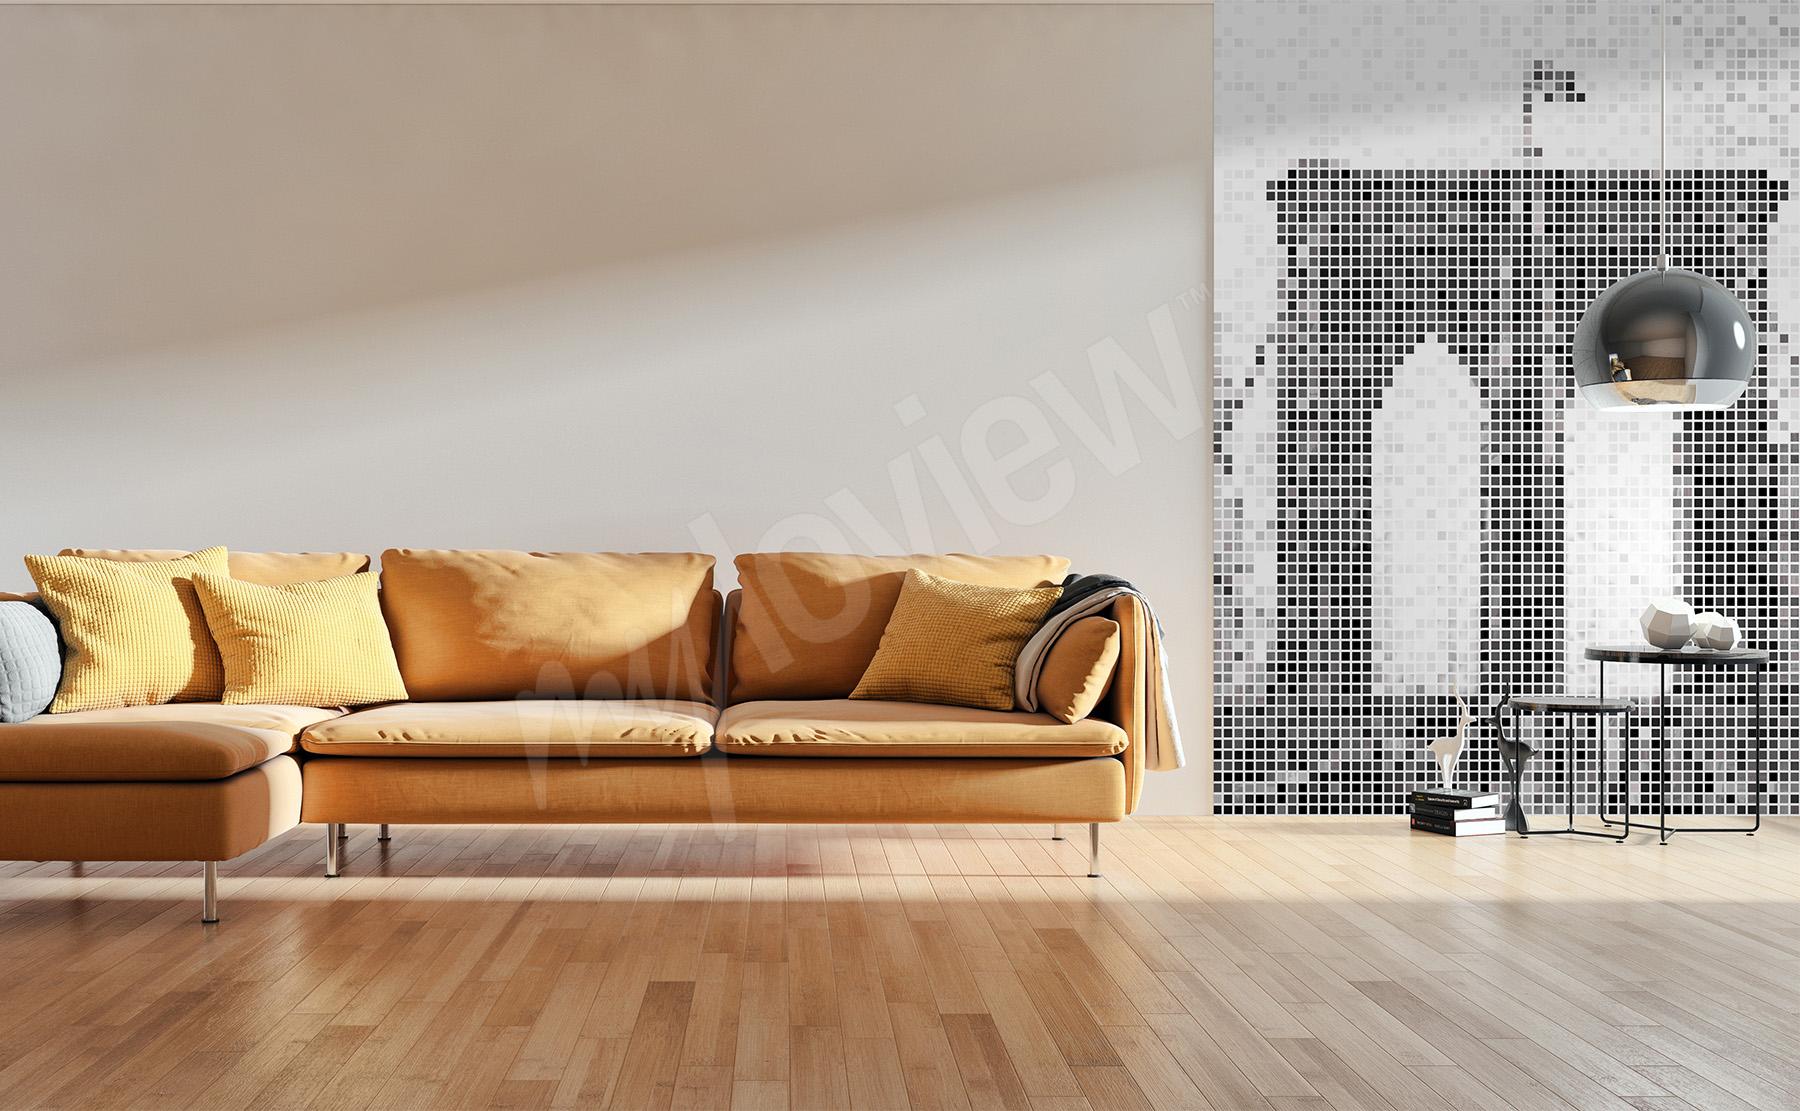 awesome fototapete wohnzimmer beige photos